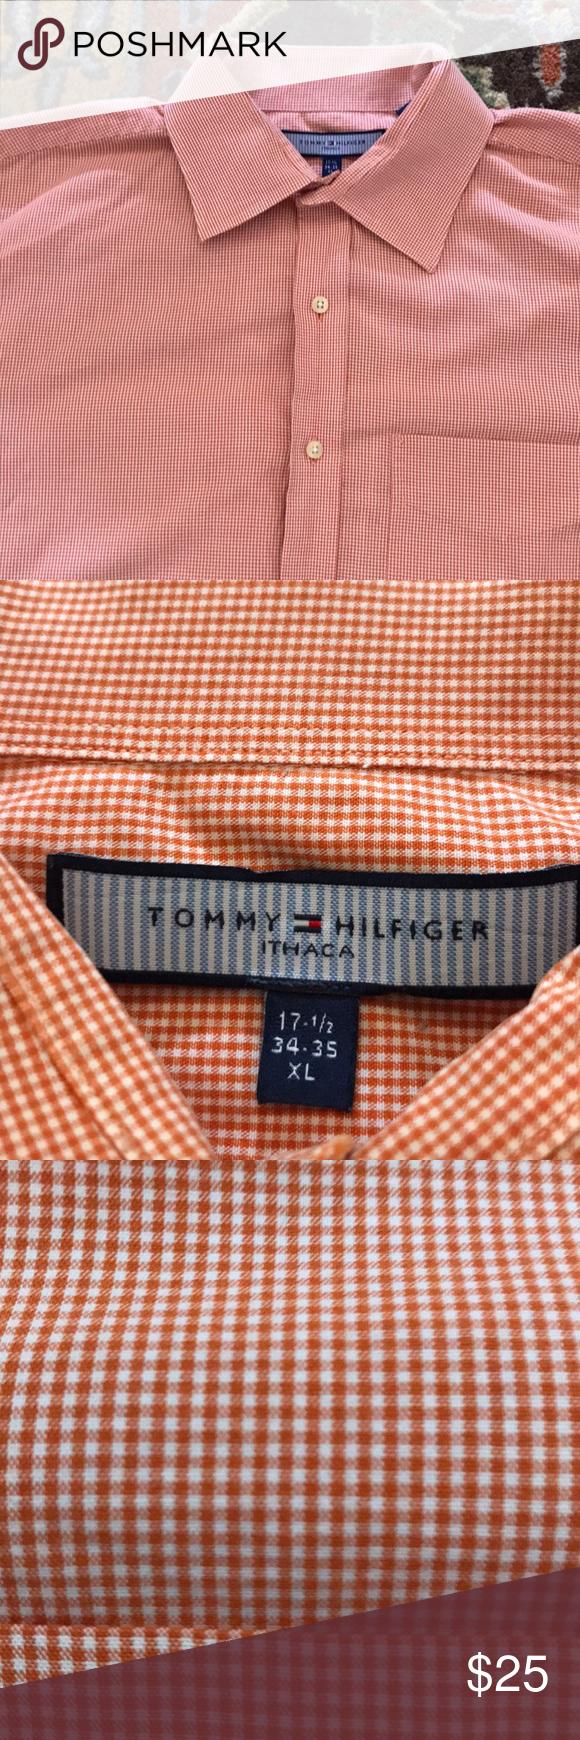 Men S Tommy Hilfiger Dress Shirt Burnt Orange Tangerine Cotton Dress Shirt The Print Is A Small Gingham Check W Tommy Hilfiger Dress Shirt Shirt Dress Shirts [ 1740 x 580 Pixel ]